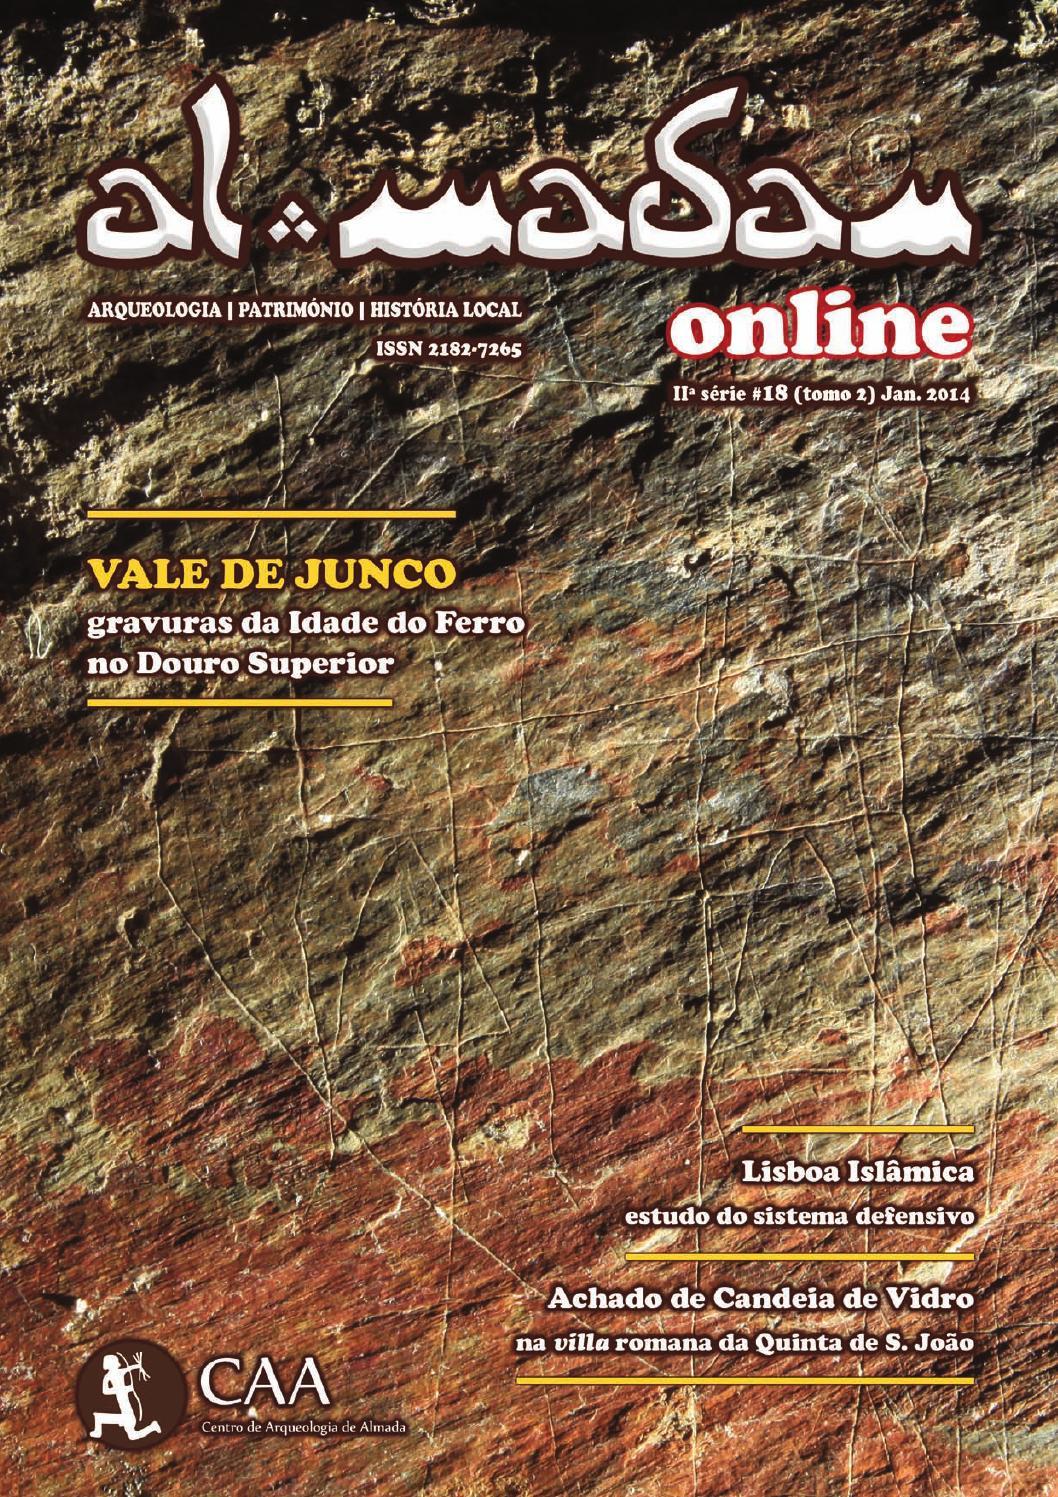 Al-Madan Online 18-2 by Al-Madan Online - issuu a58e0b0a7da24